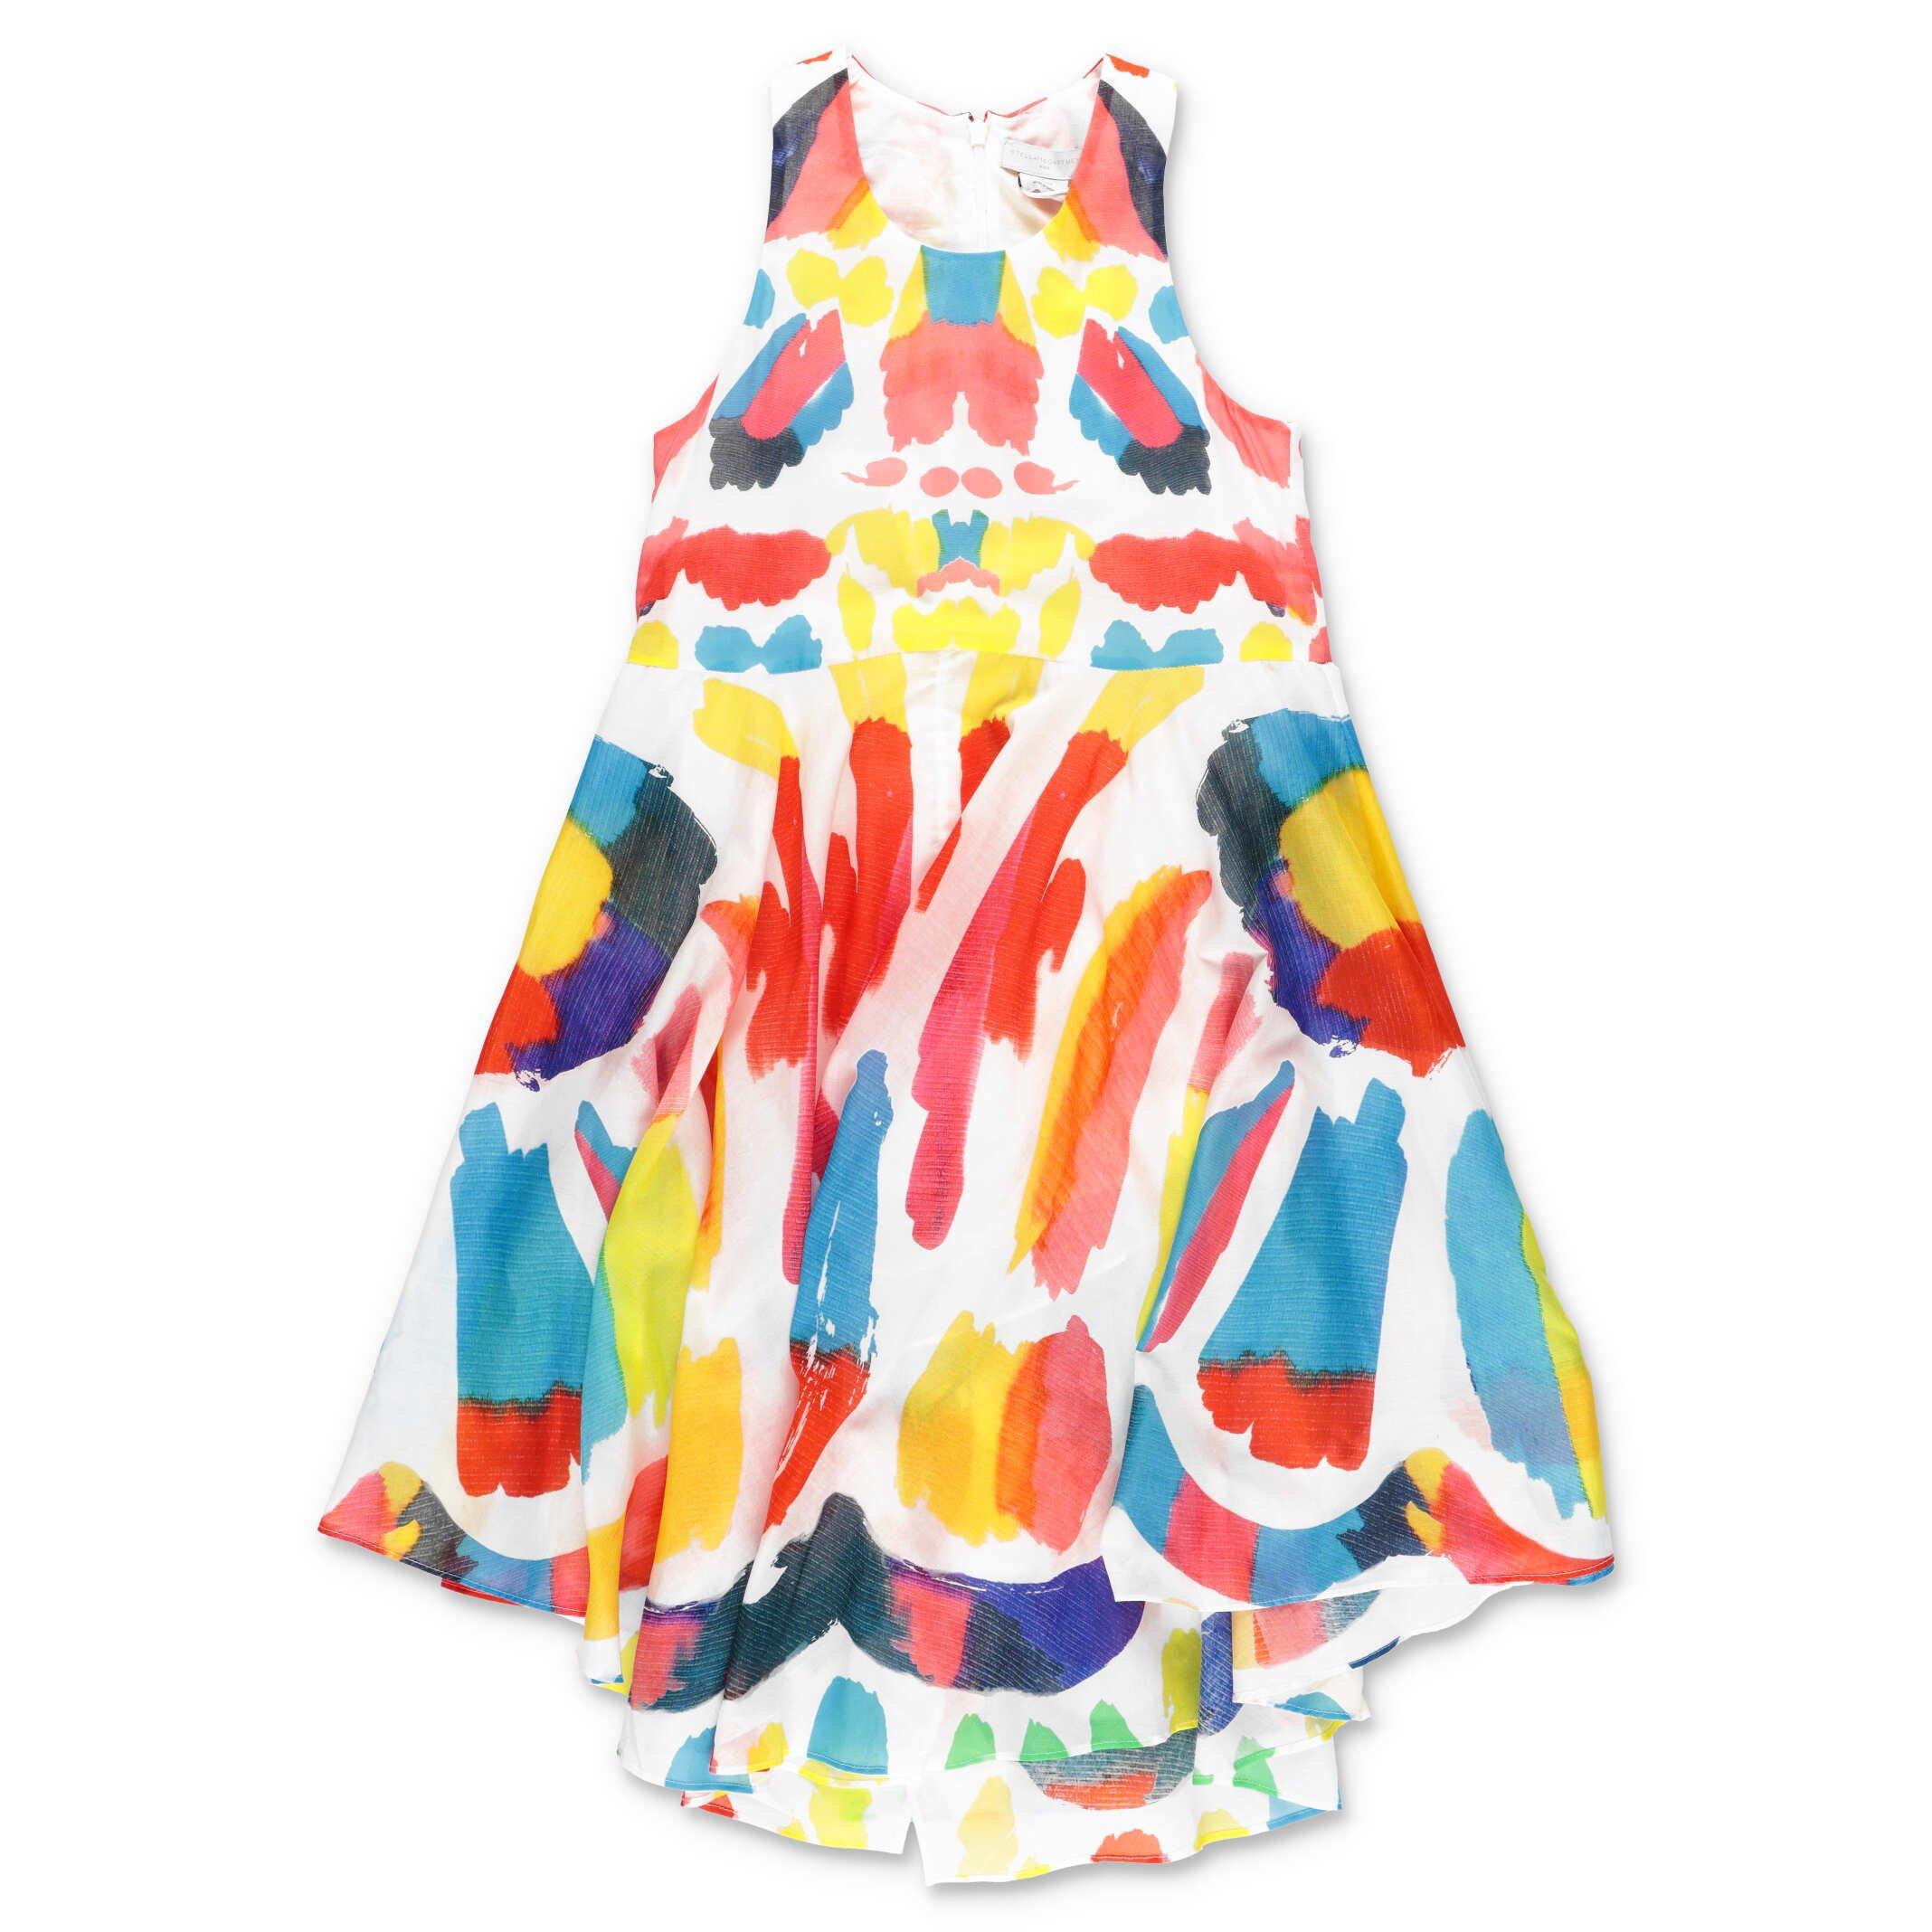 Stella McCartney dress multicolor cotton muslin teen girl